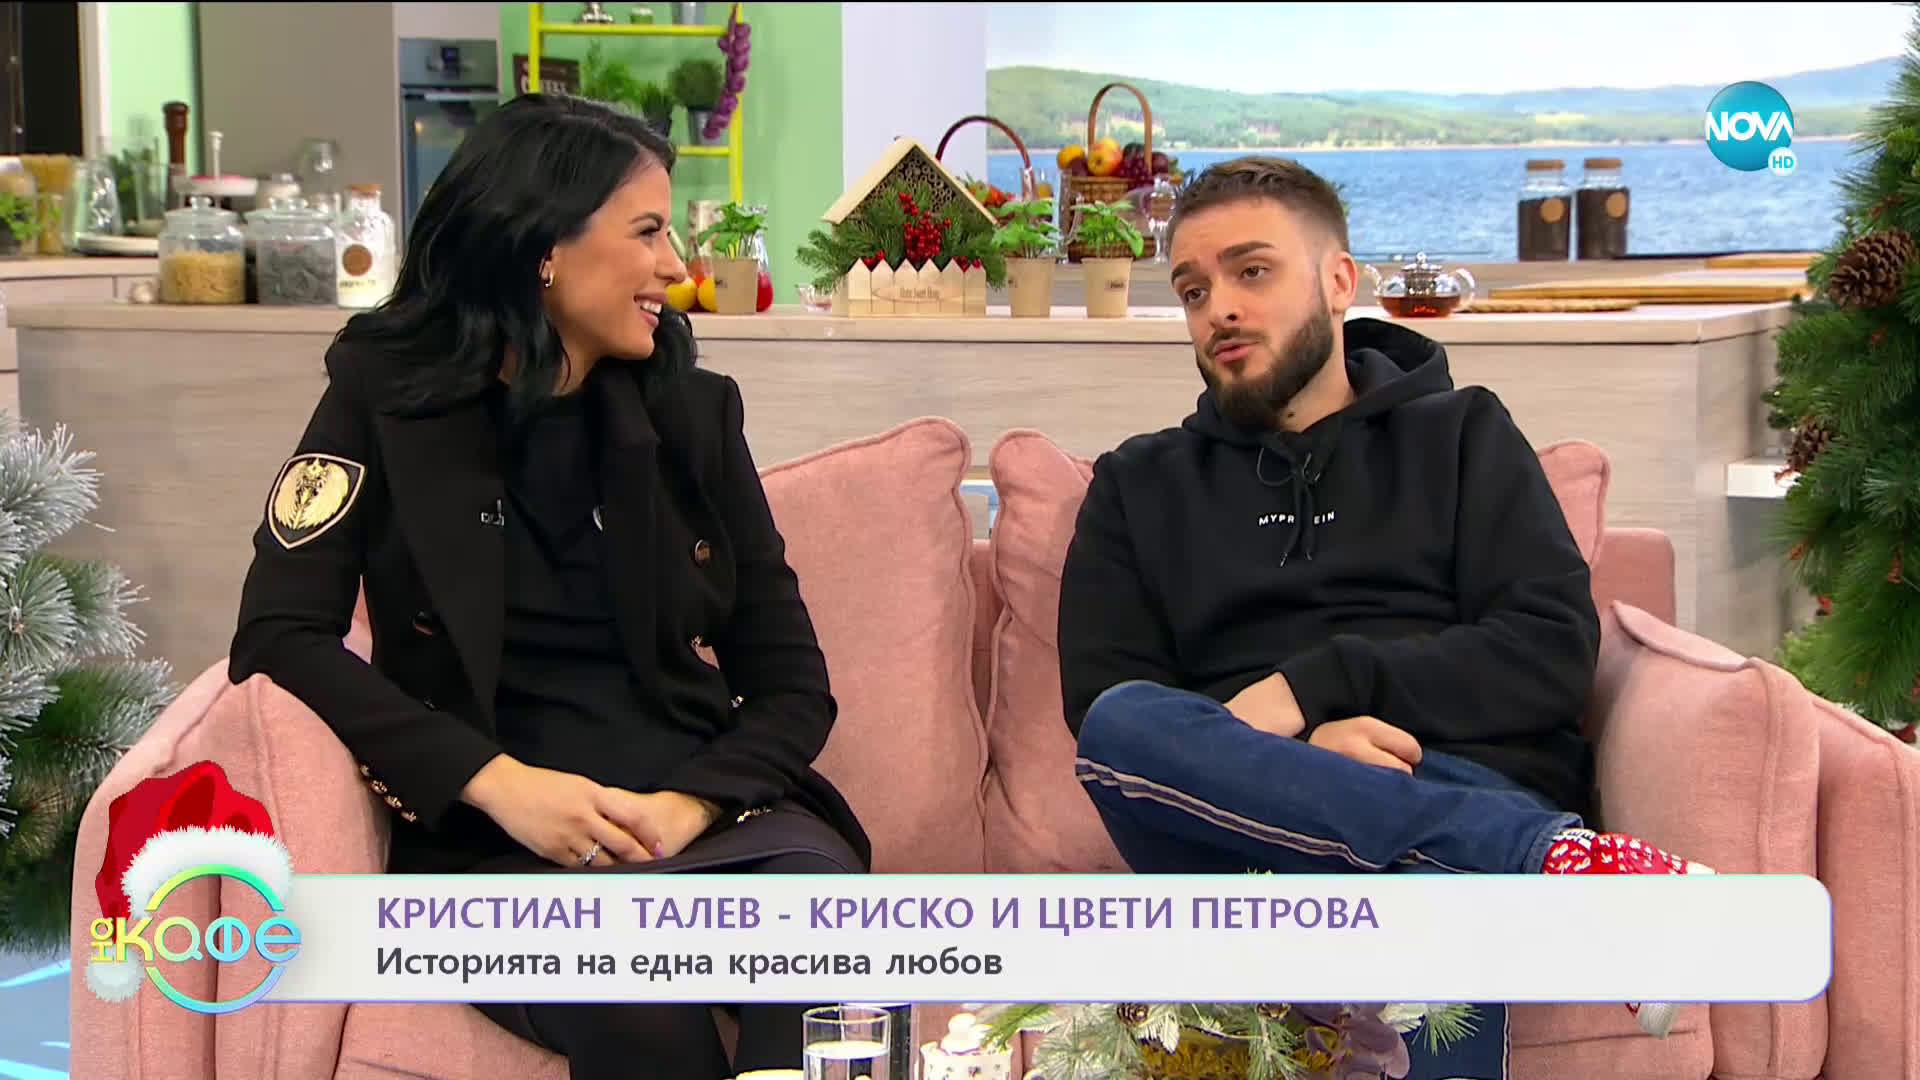 На кафе с Кристиан Талев - Криско и Цвети Петрова (24.12.2020)